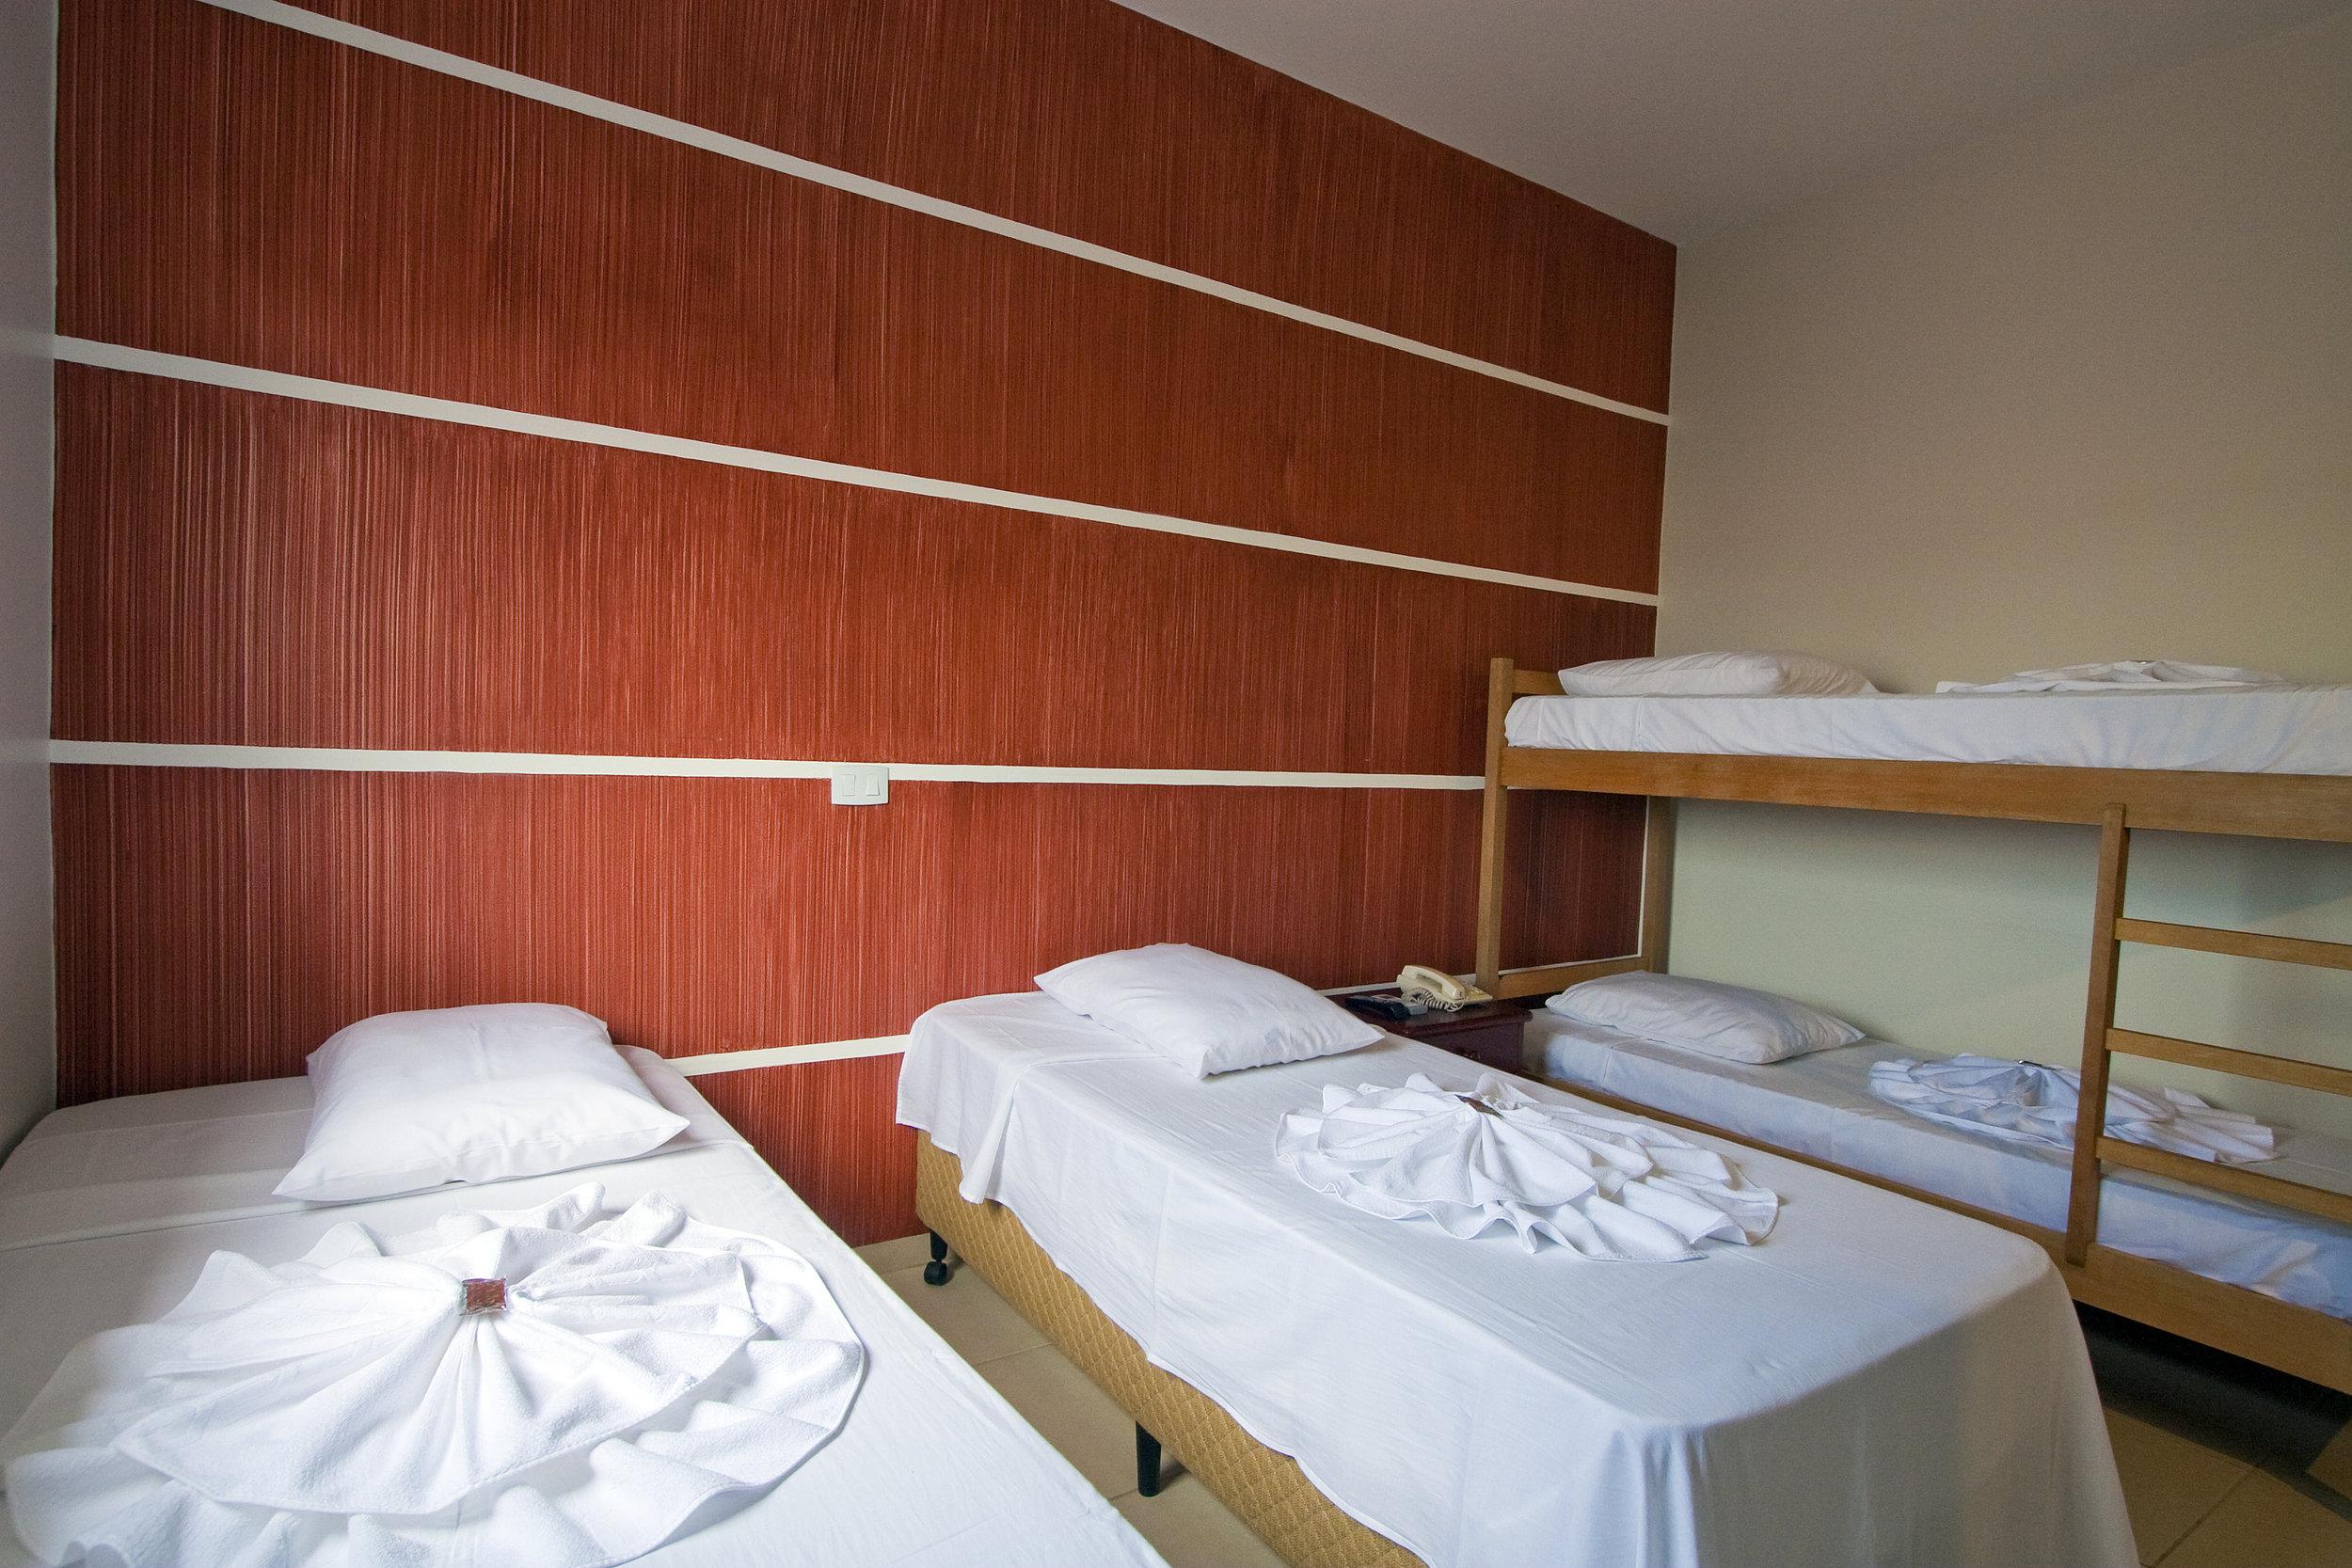 pousada_calliandra_apartamentos_20101224_0042.jpg